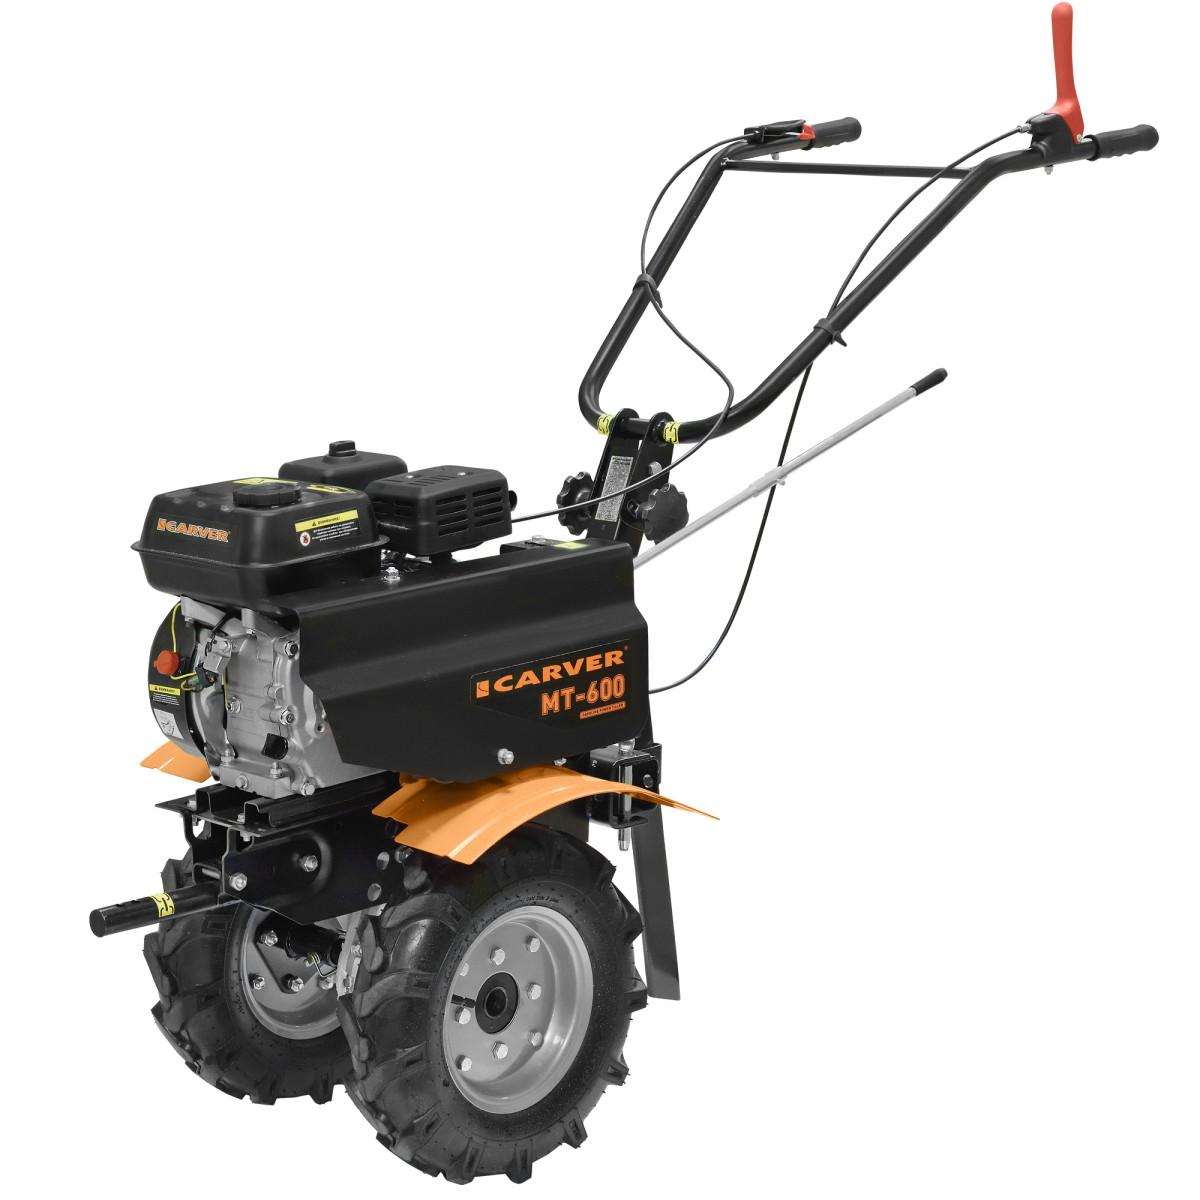 Мотоблок Carver МТ-600 4800 Вт